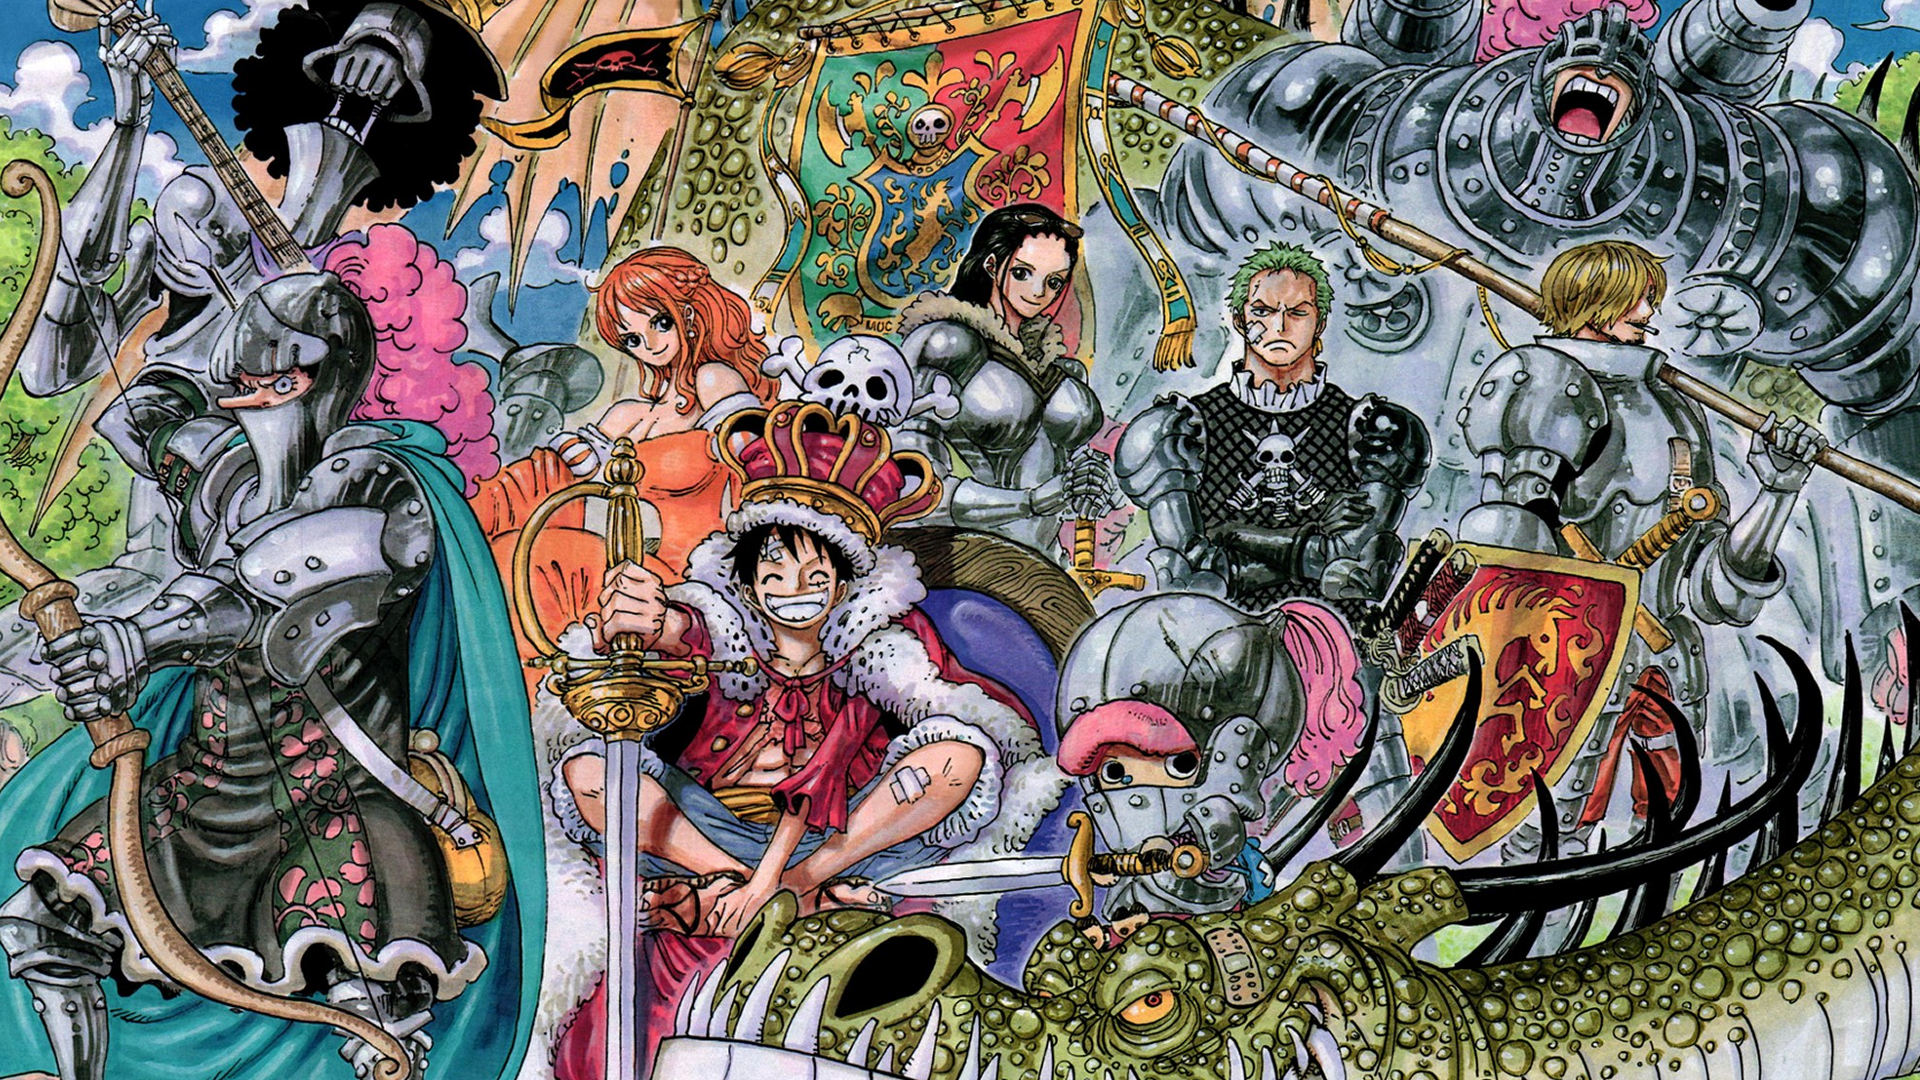 One Piece Fond d'écran HD | Arrière-Plan | 1920x1080 | ID:996396 - Wallpaper Abyss